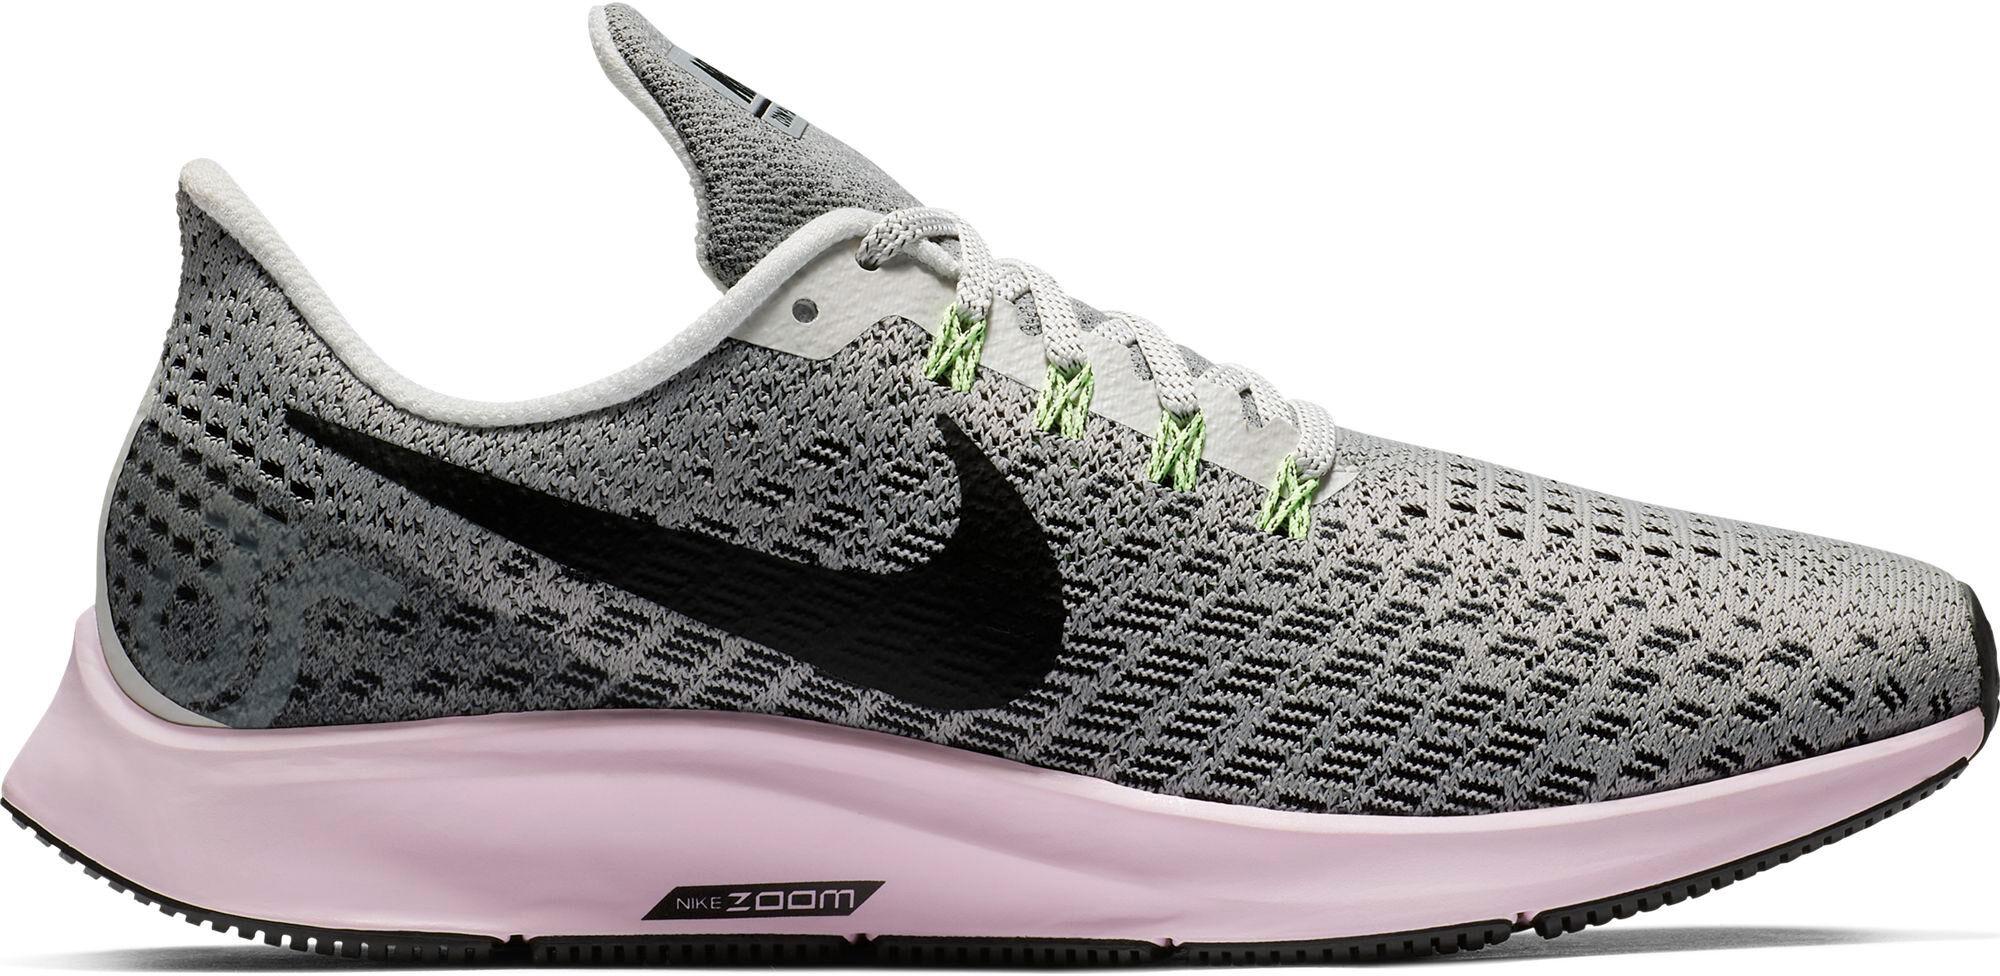 Zapatillas Intersport Nike Intersport Zapatillas Nike Zapatillas Mujer Mujer Mujer Intersport Nike WP5wTpIq